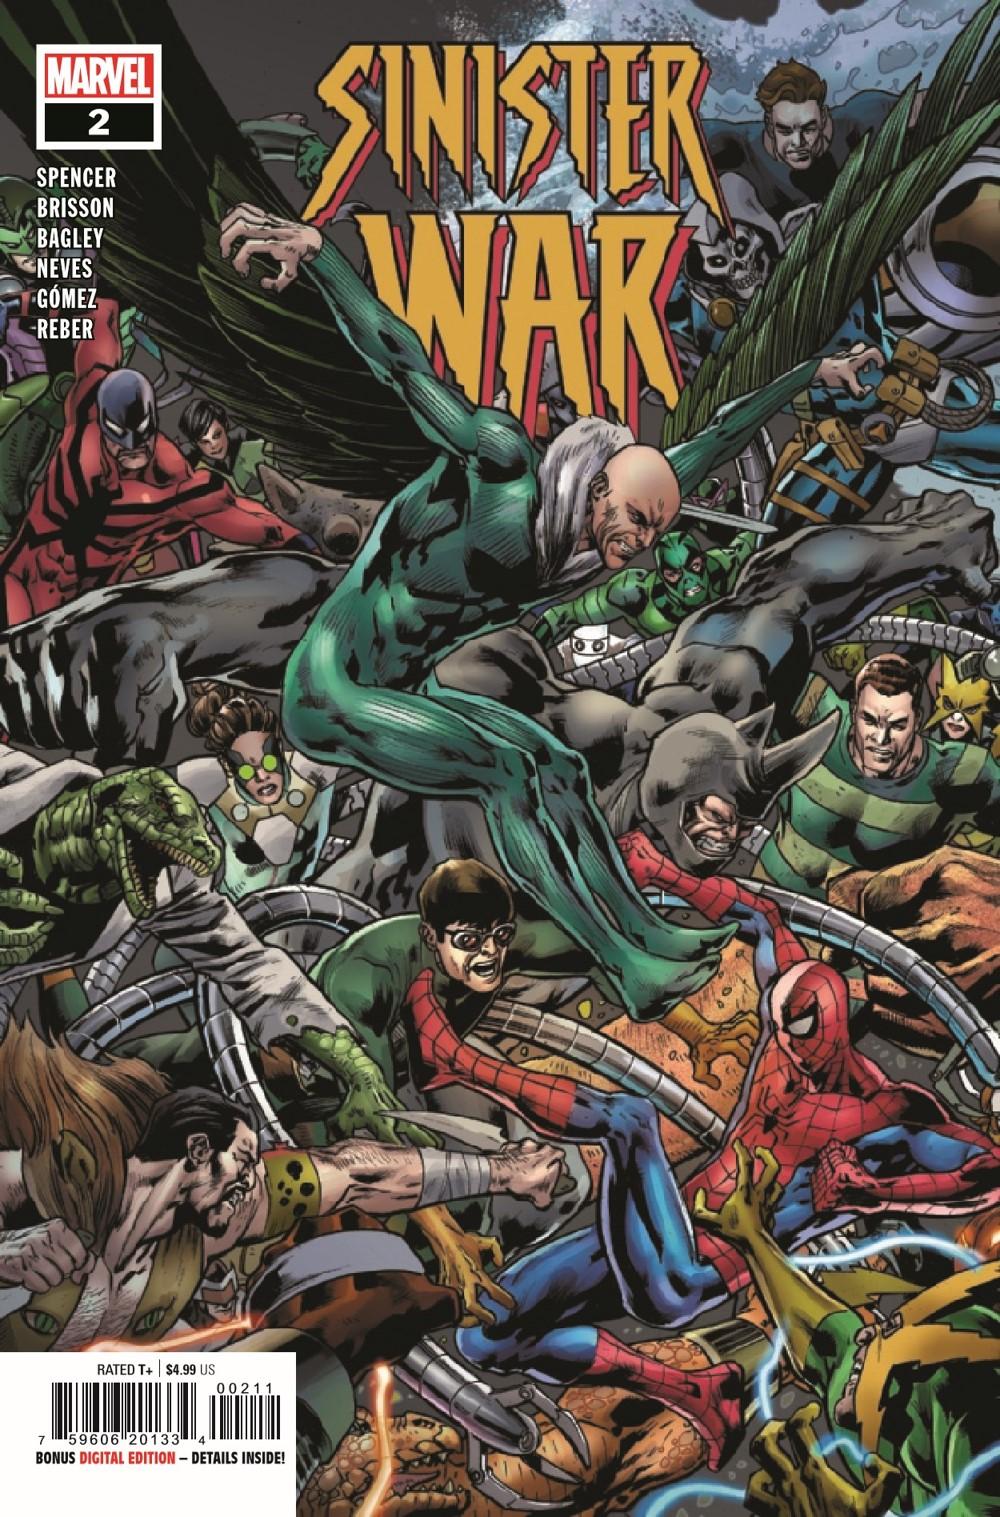 SINISTERWAR2021002_Preview-1 ComicList Previews: SINISTER WAR #2 (OF 4)